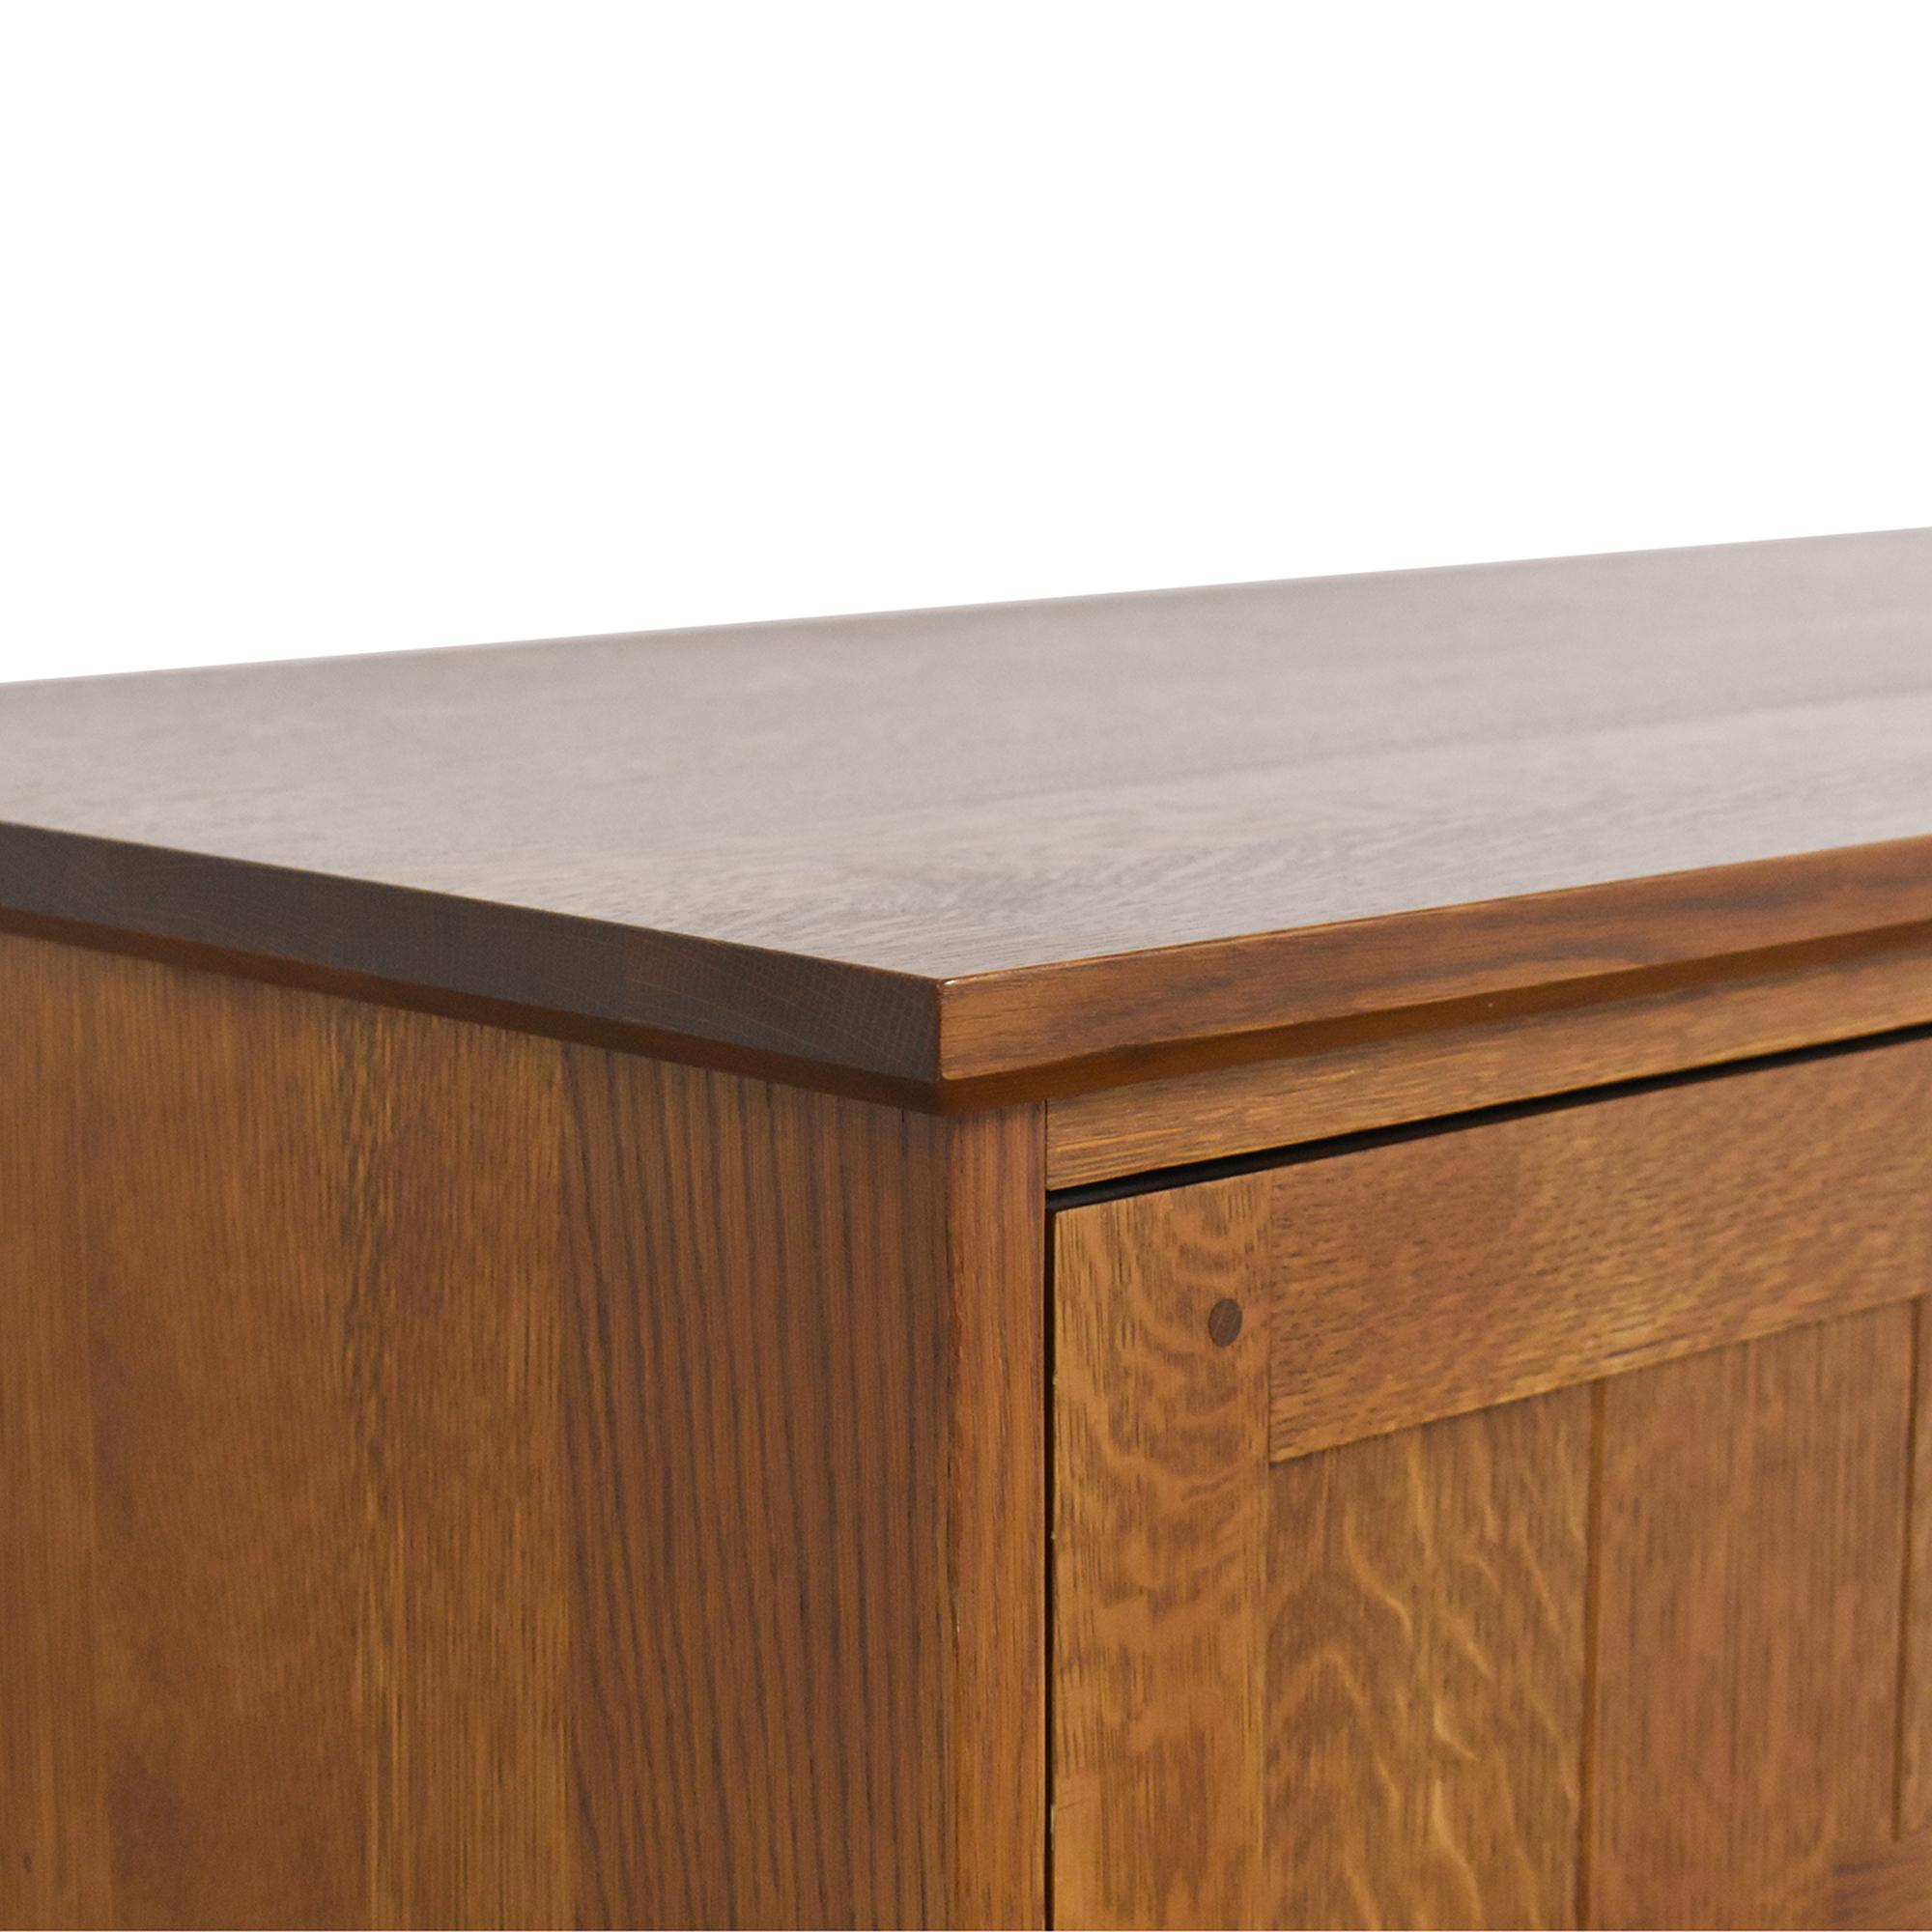 Stickley Furniture Stickley Furniture Media Cabinet for sale